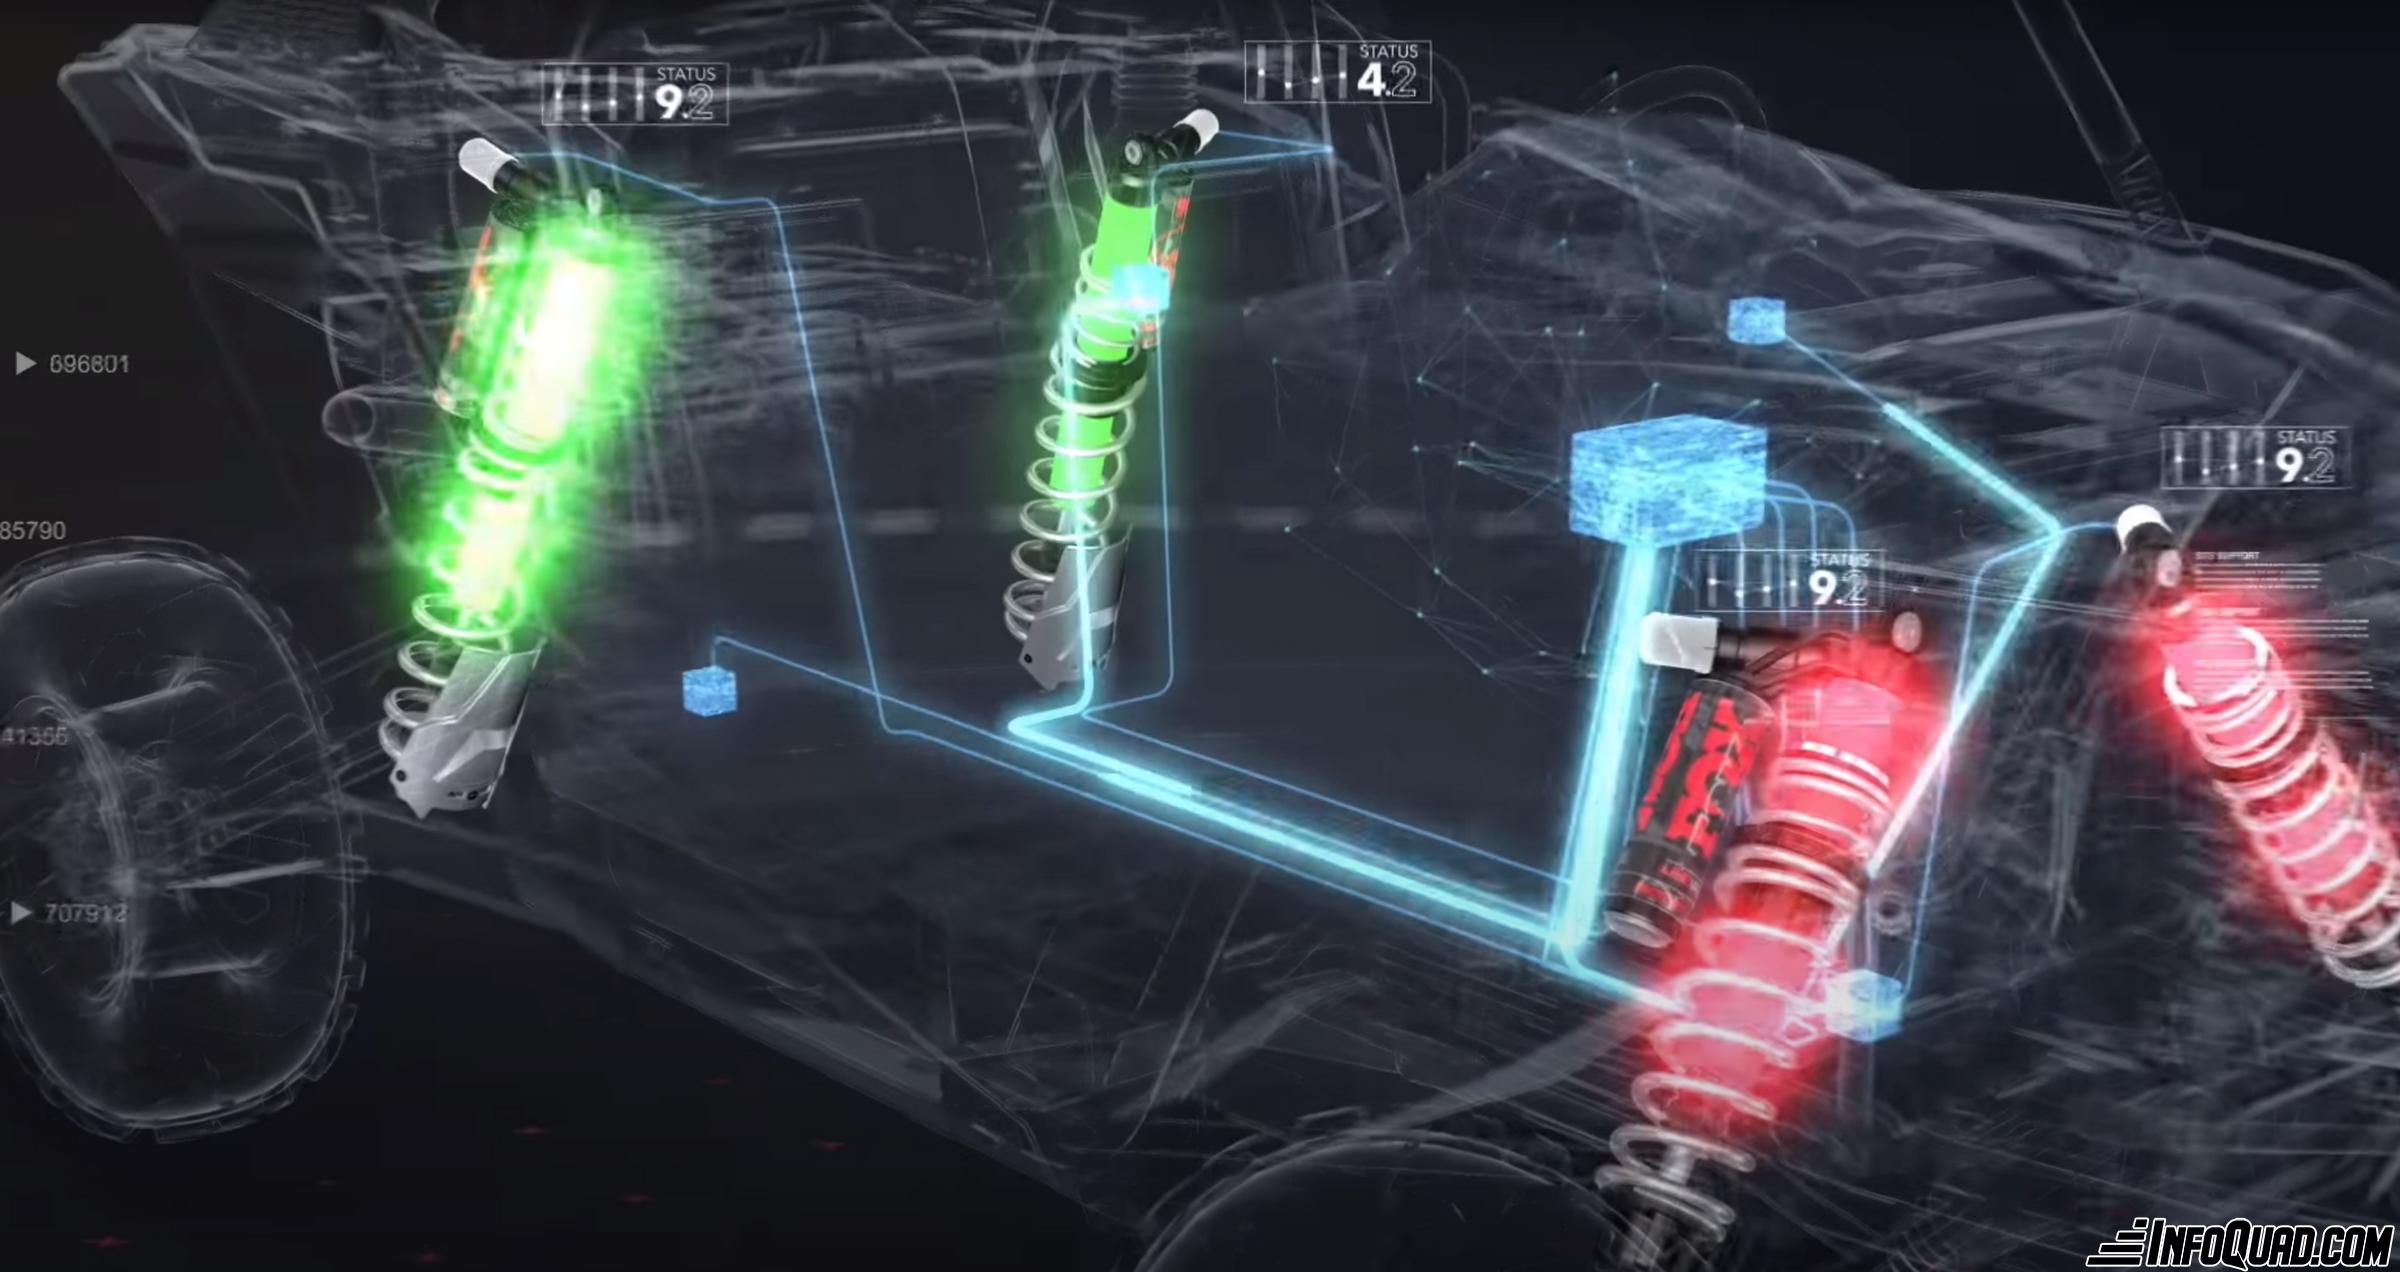 Innovative technologies: Semi-active suspensions